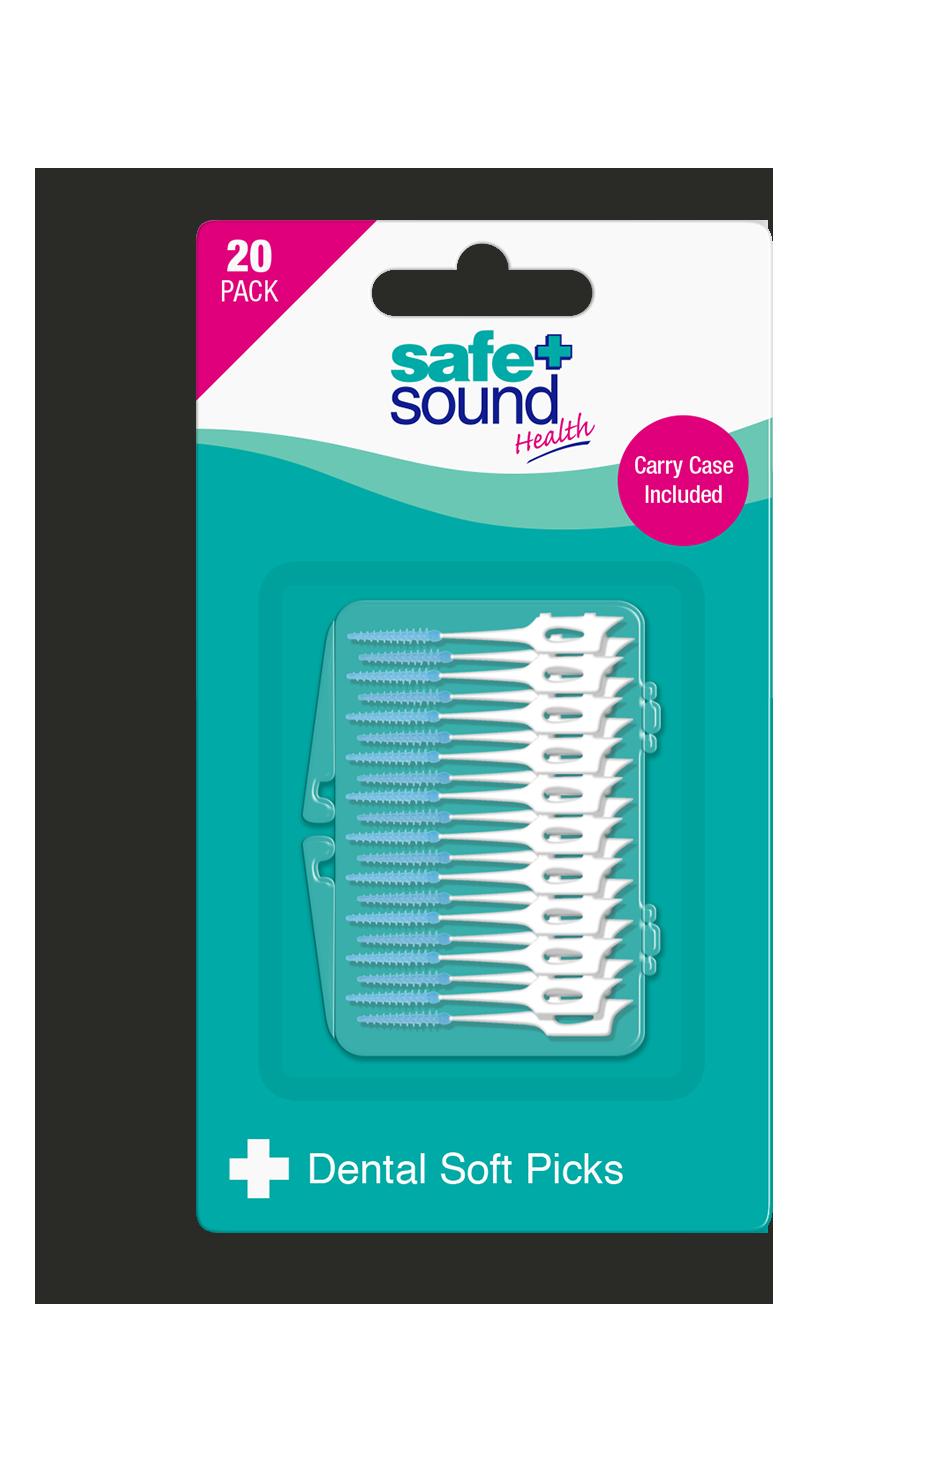 Safe and Sound Health Soft Dental Picks